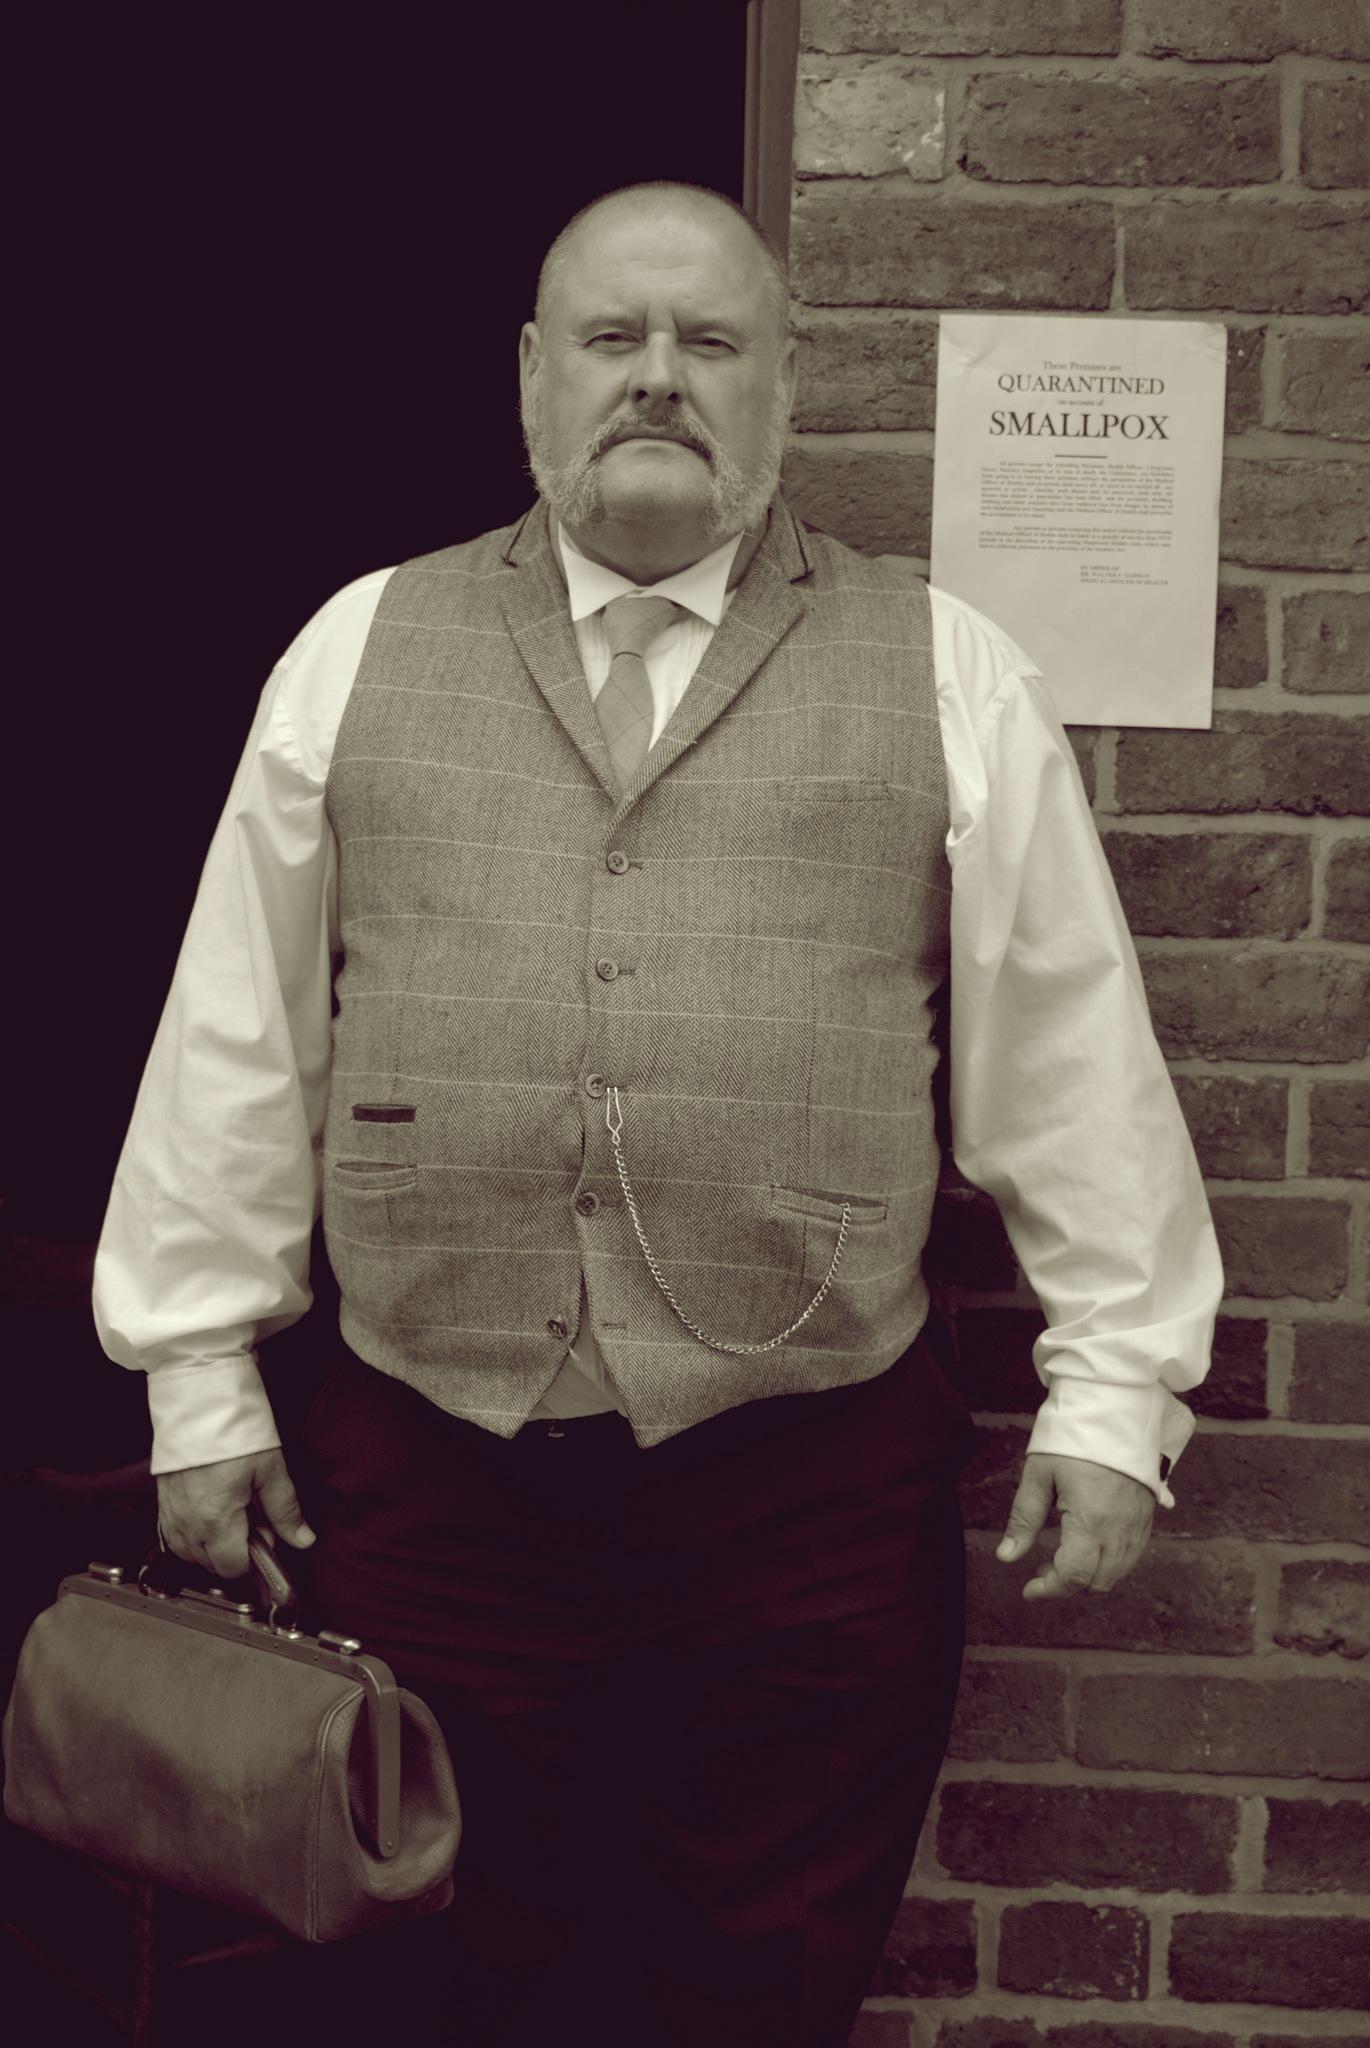 Pawn Broker by Michael James De Grey